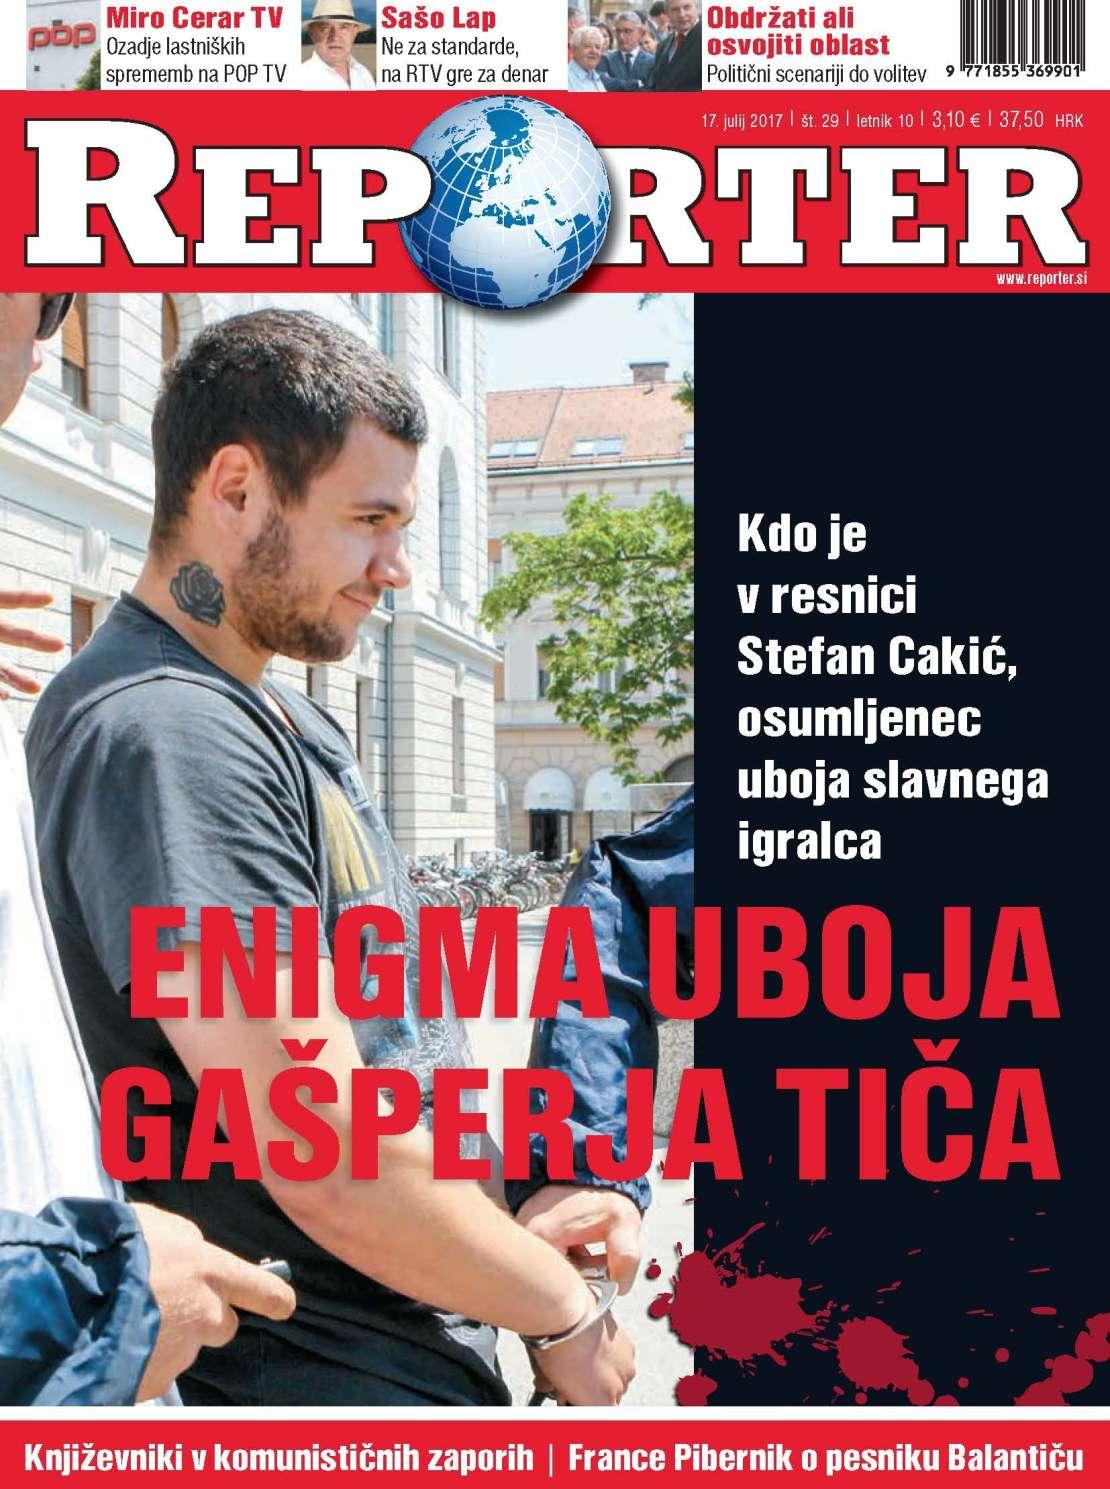 Reporter.si